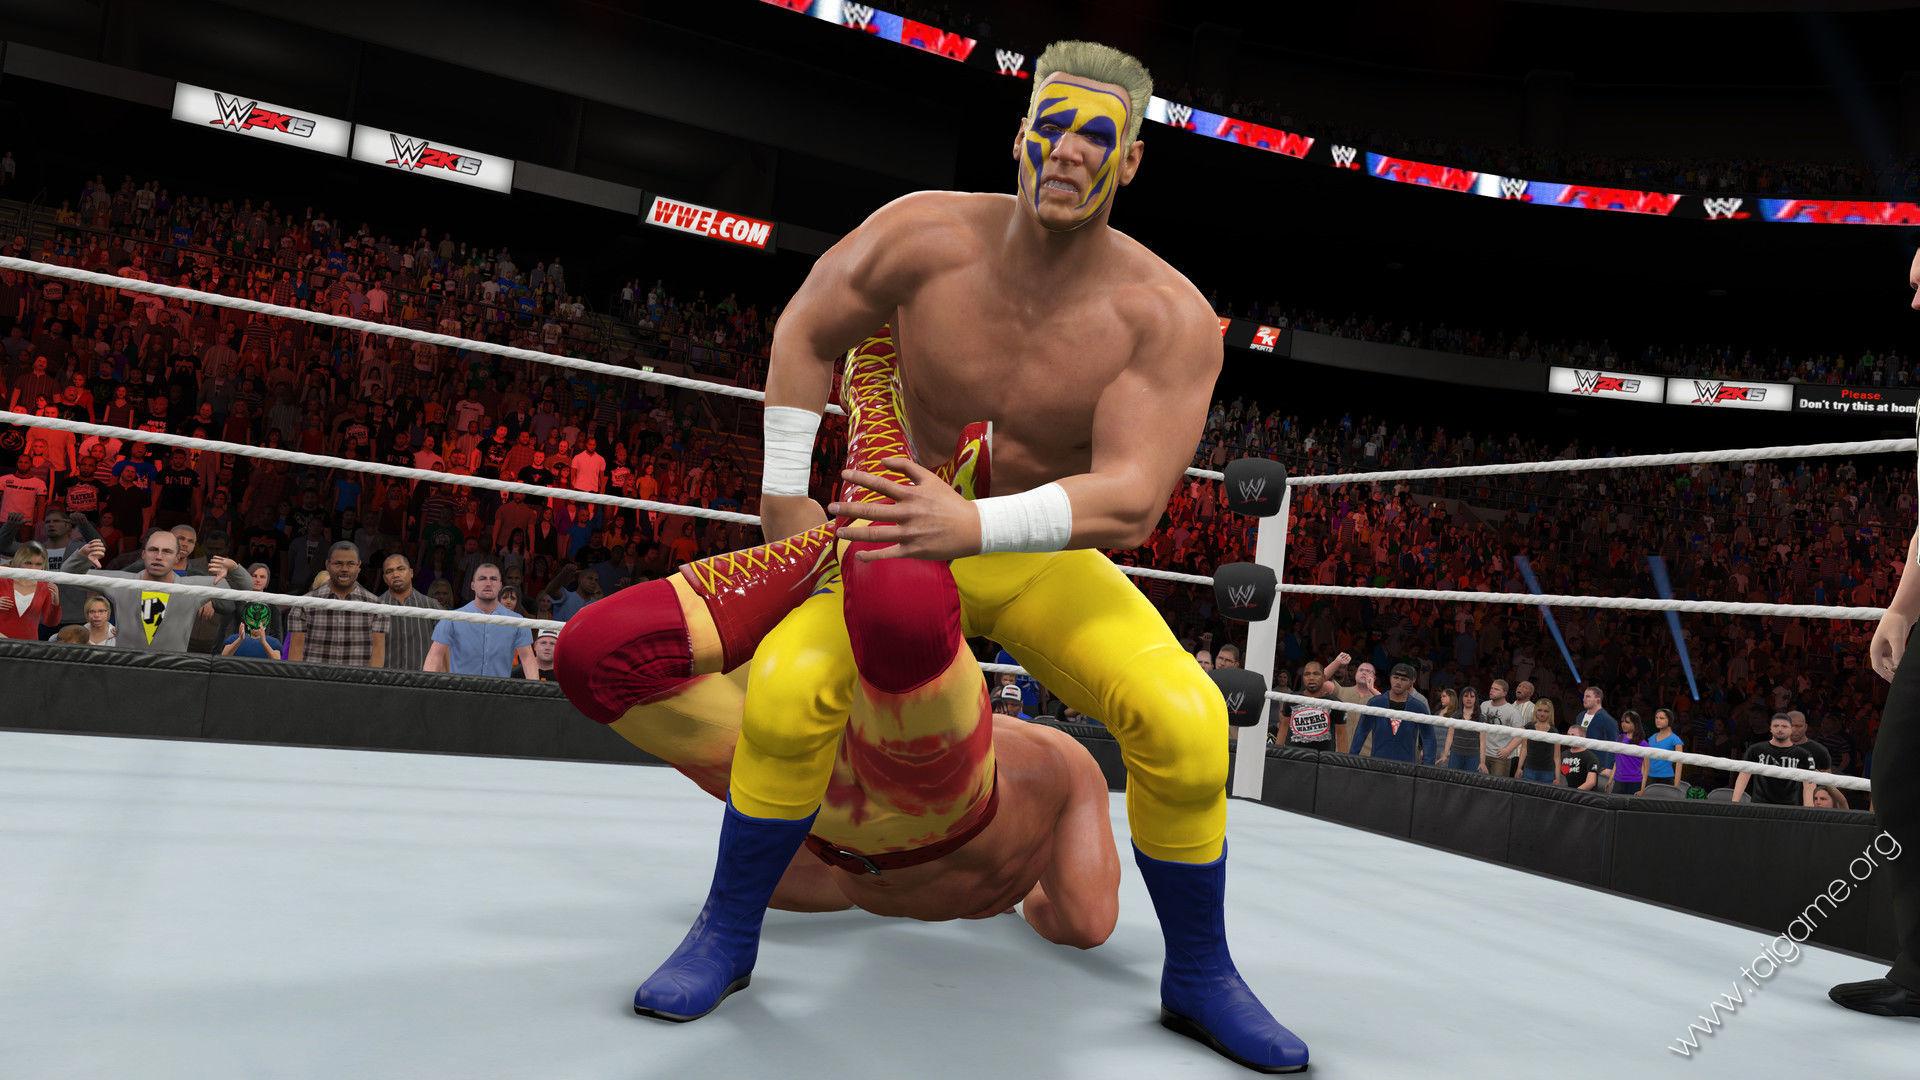 WWE 2K15 - Download Free Full Games | Fighting games